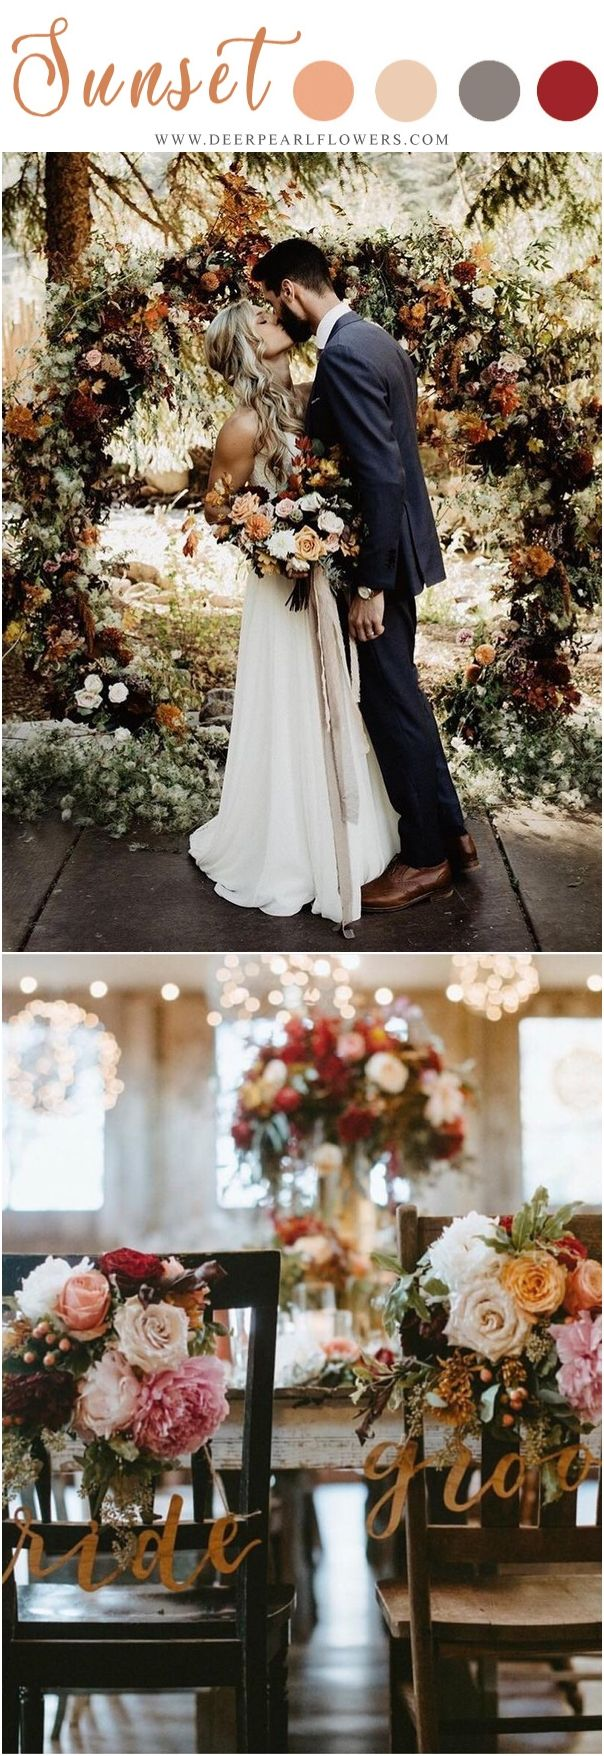 sunset orange fall wedding color ideas - fall wedding decor ideas #weddings #wed...